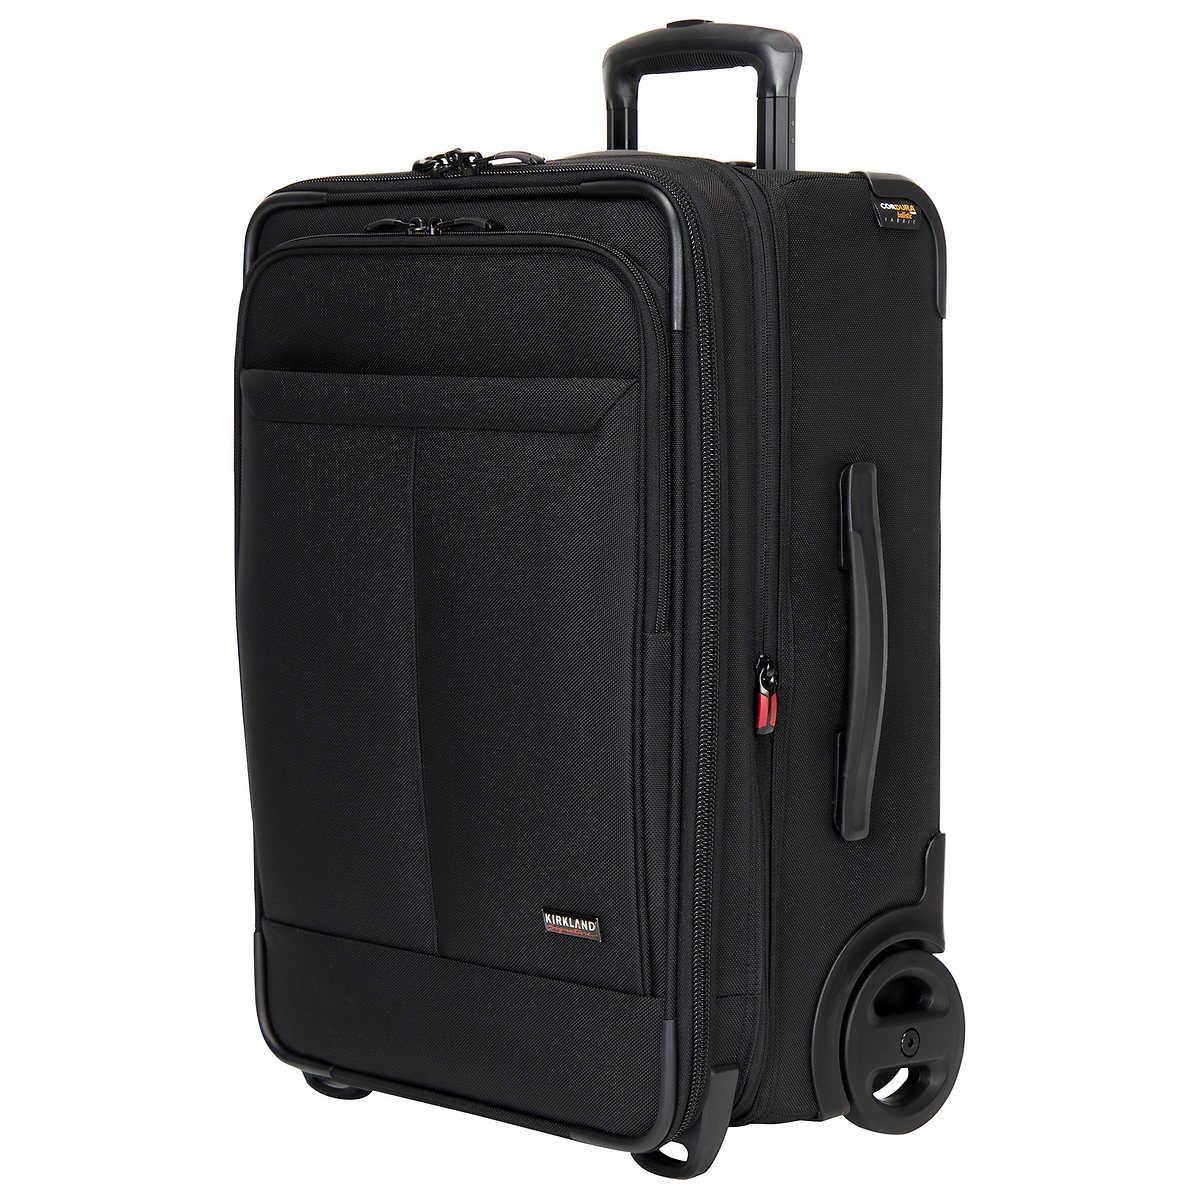 Kirkland Signature Luggage {Costco Store-Brand}